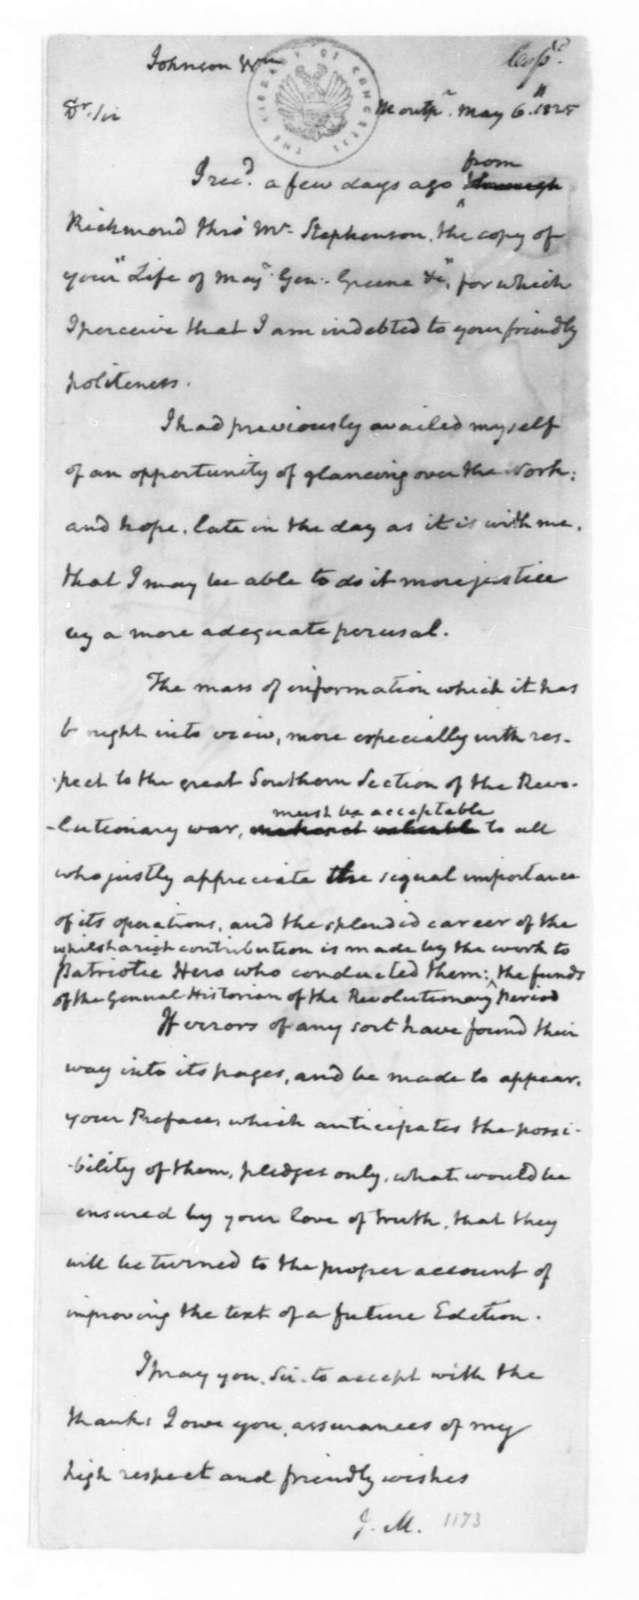 James Madison to William Johnson, May 6, 1825.